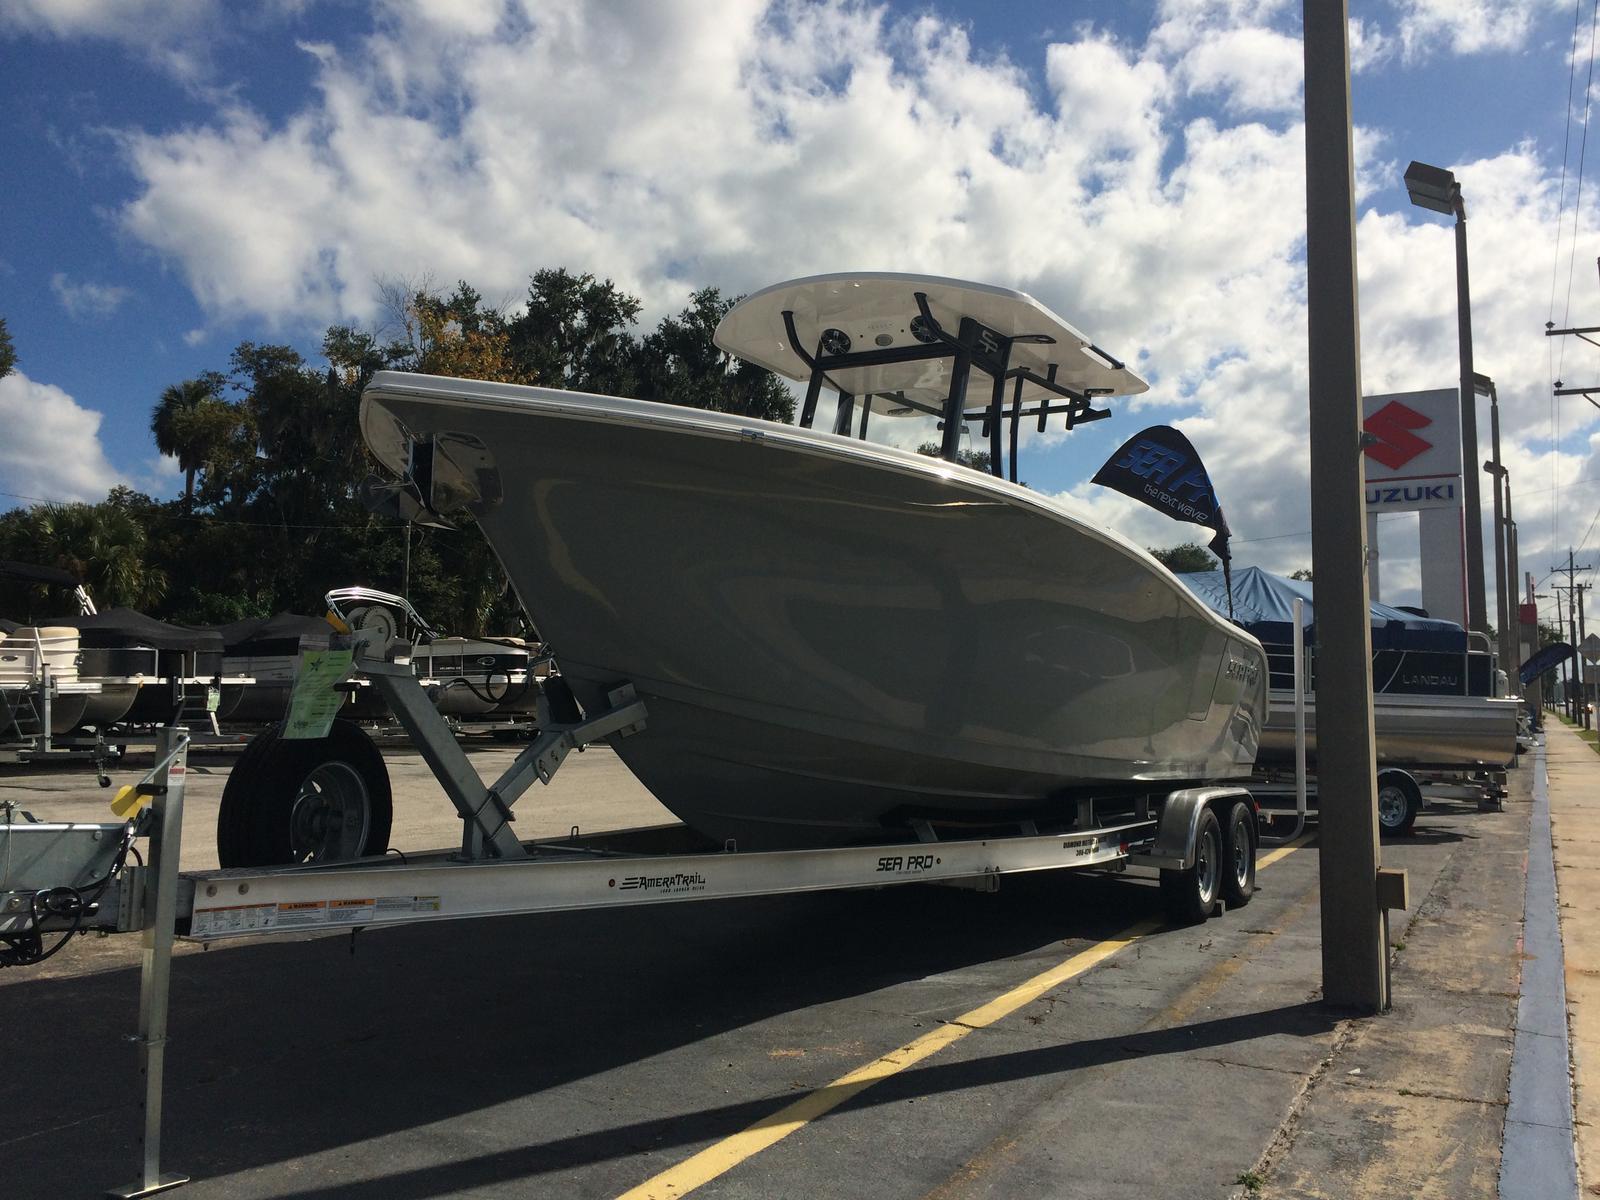 Sea Pro 259 Deep V Series